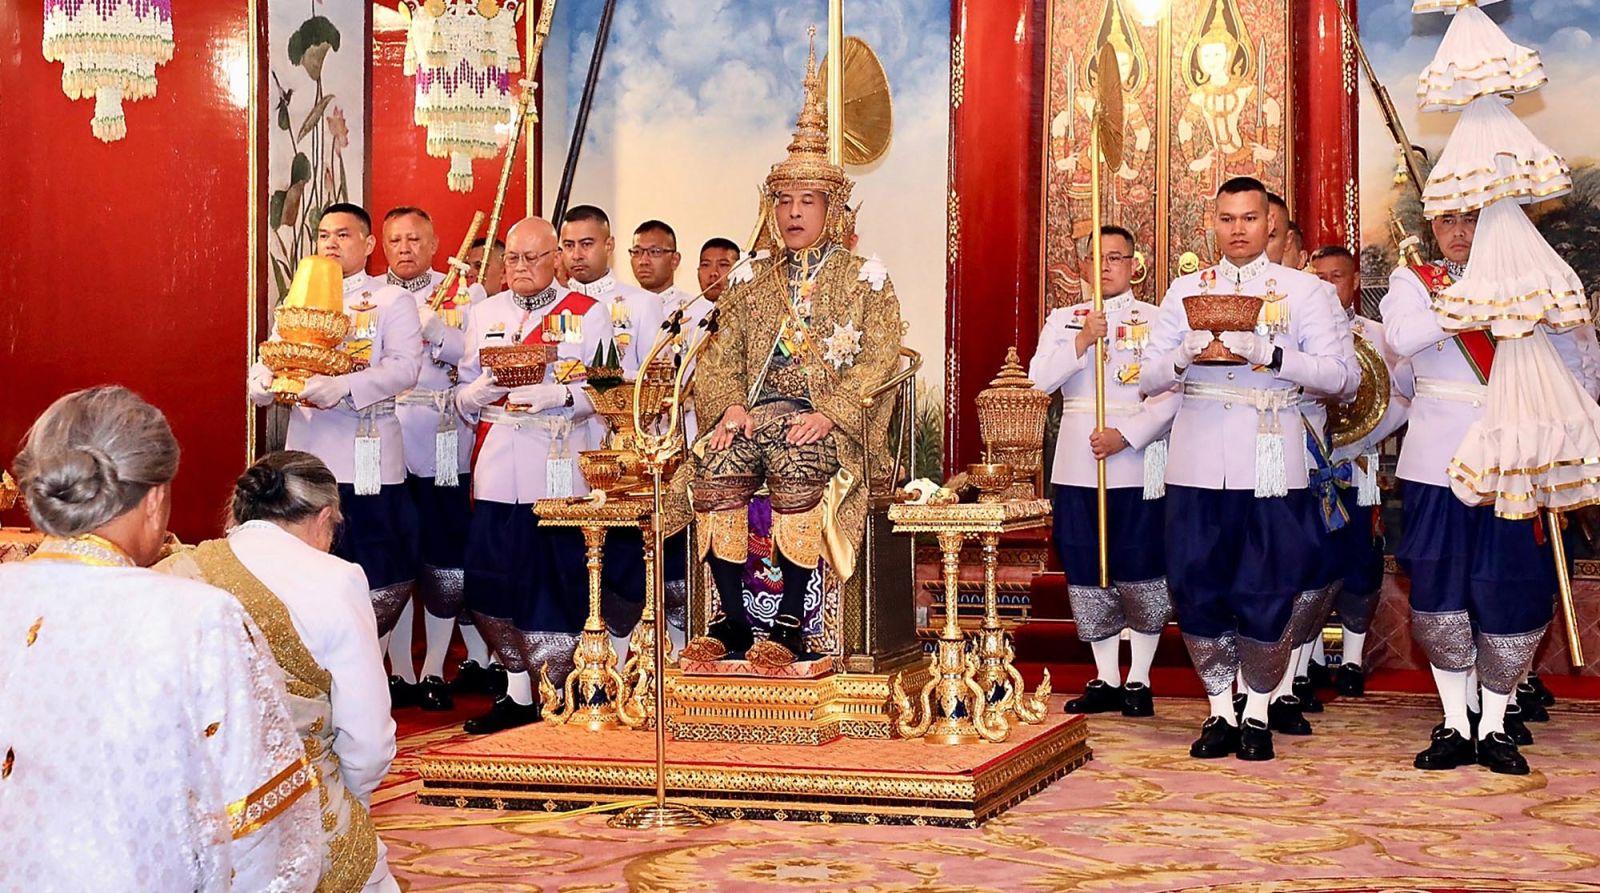 Thailand Officially Crowns King Maha Vajiralongkorn In An Elaborate Three-Day Ceremony